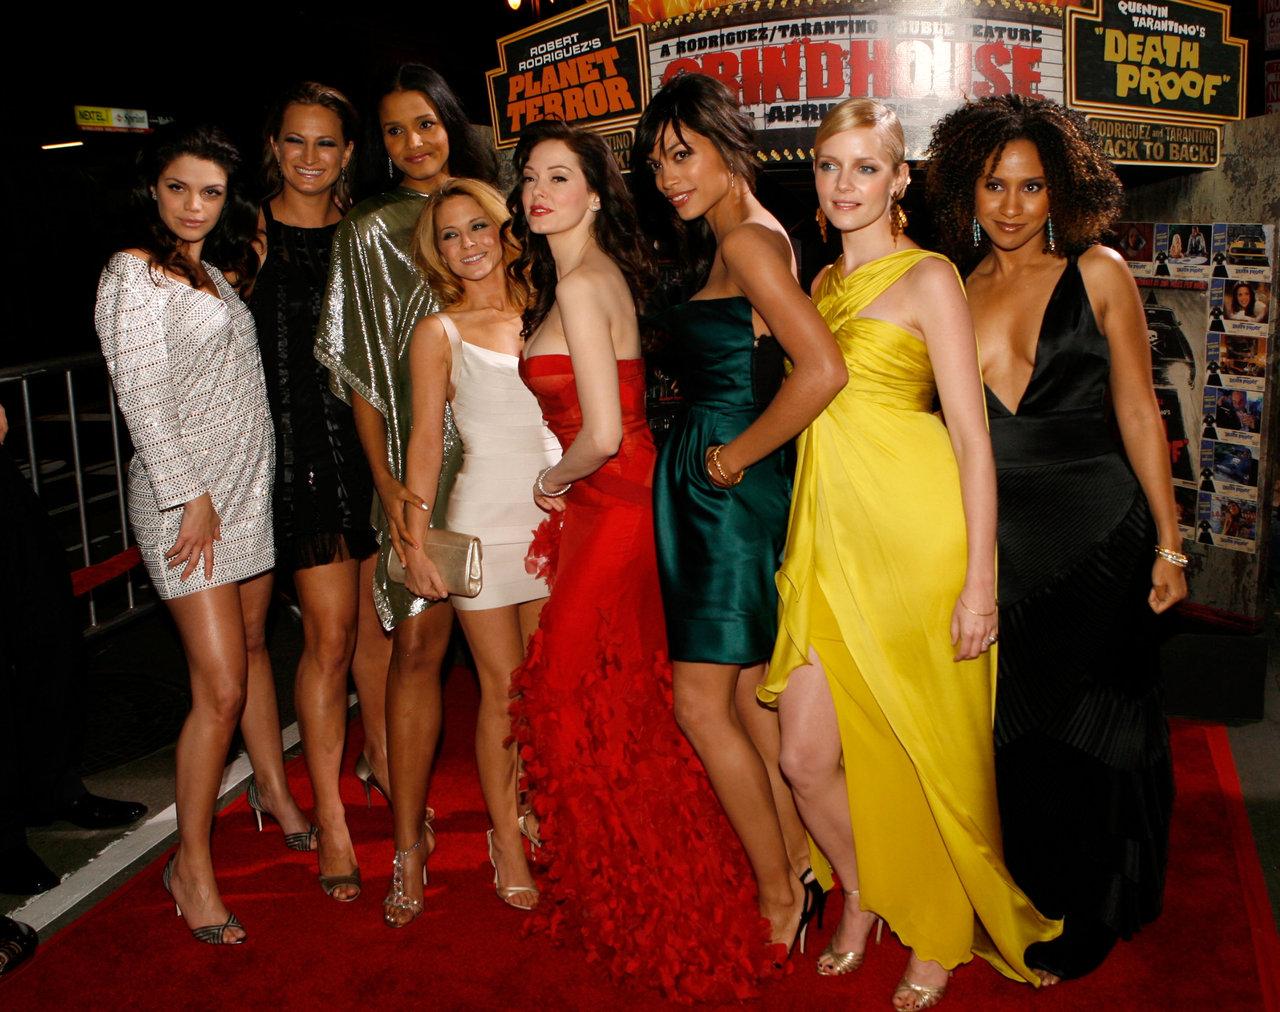 http://2.bp.blogspot.com/_FEkxtl1-FKs/TL1vqCoSM9I/AAAAAAAABCI/4nj89o8Rj6Q/s1600/The+Grindhouse+girls.jpg